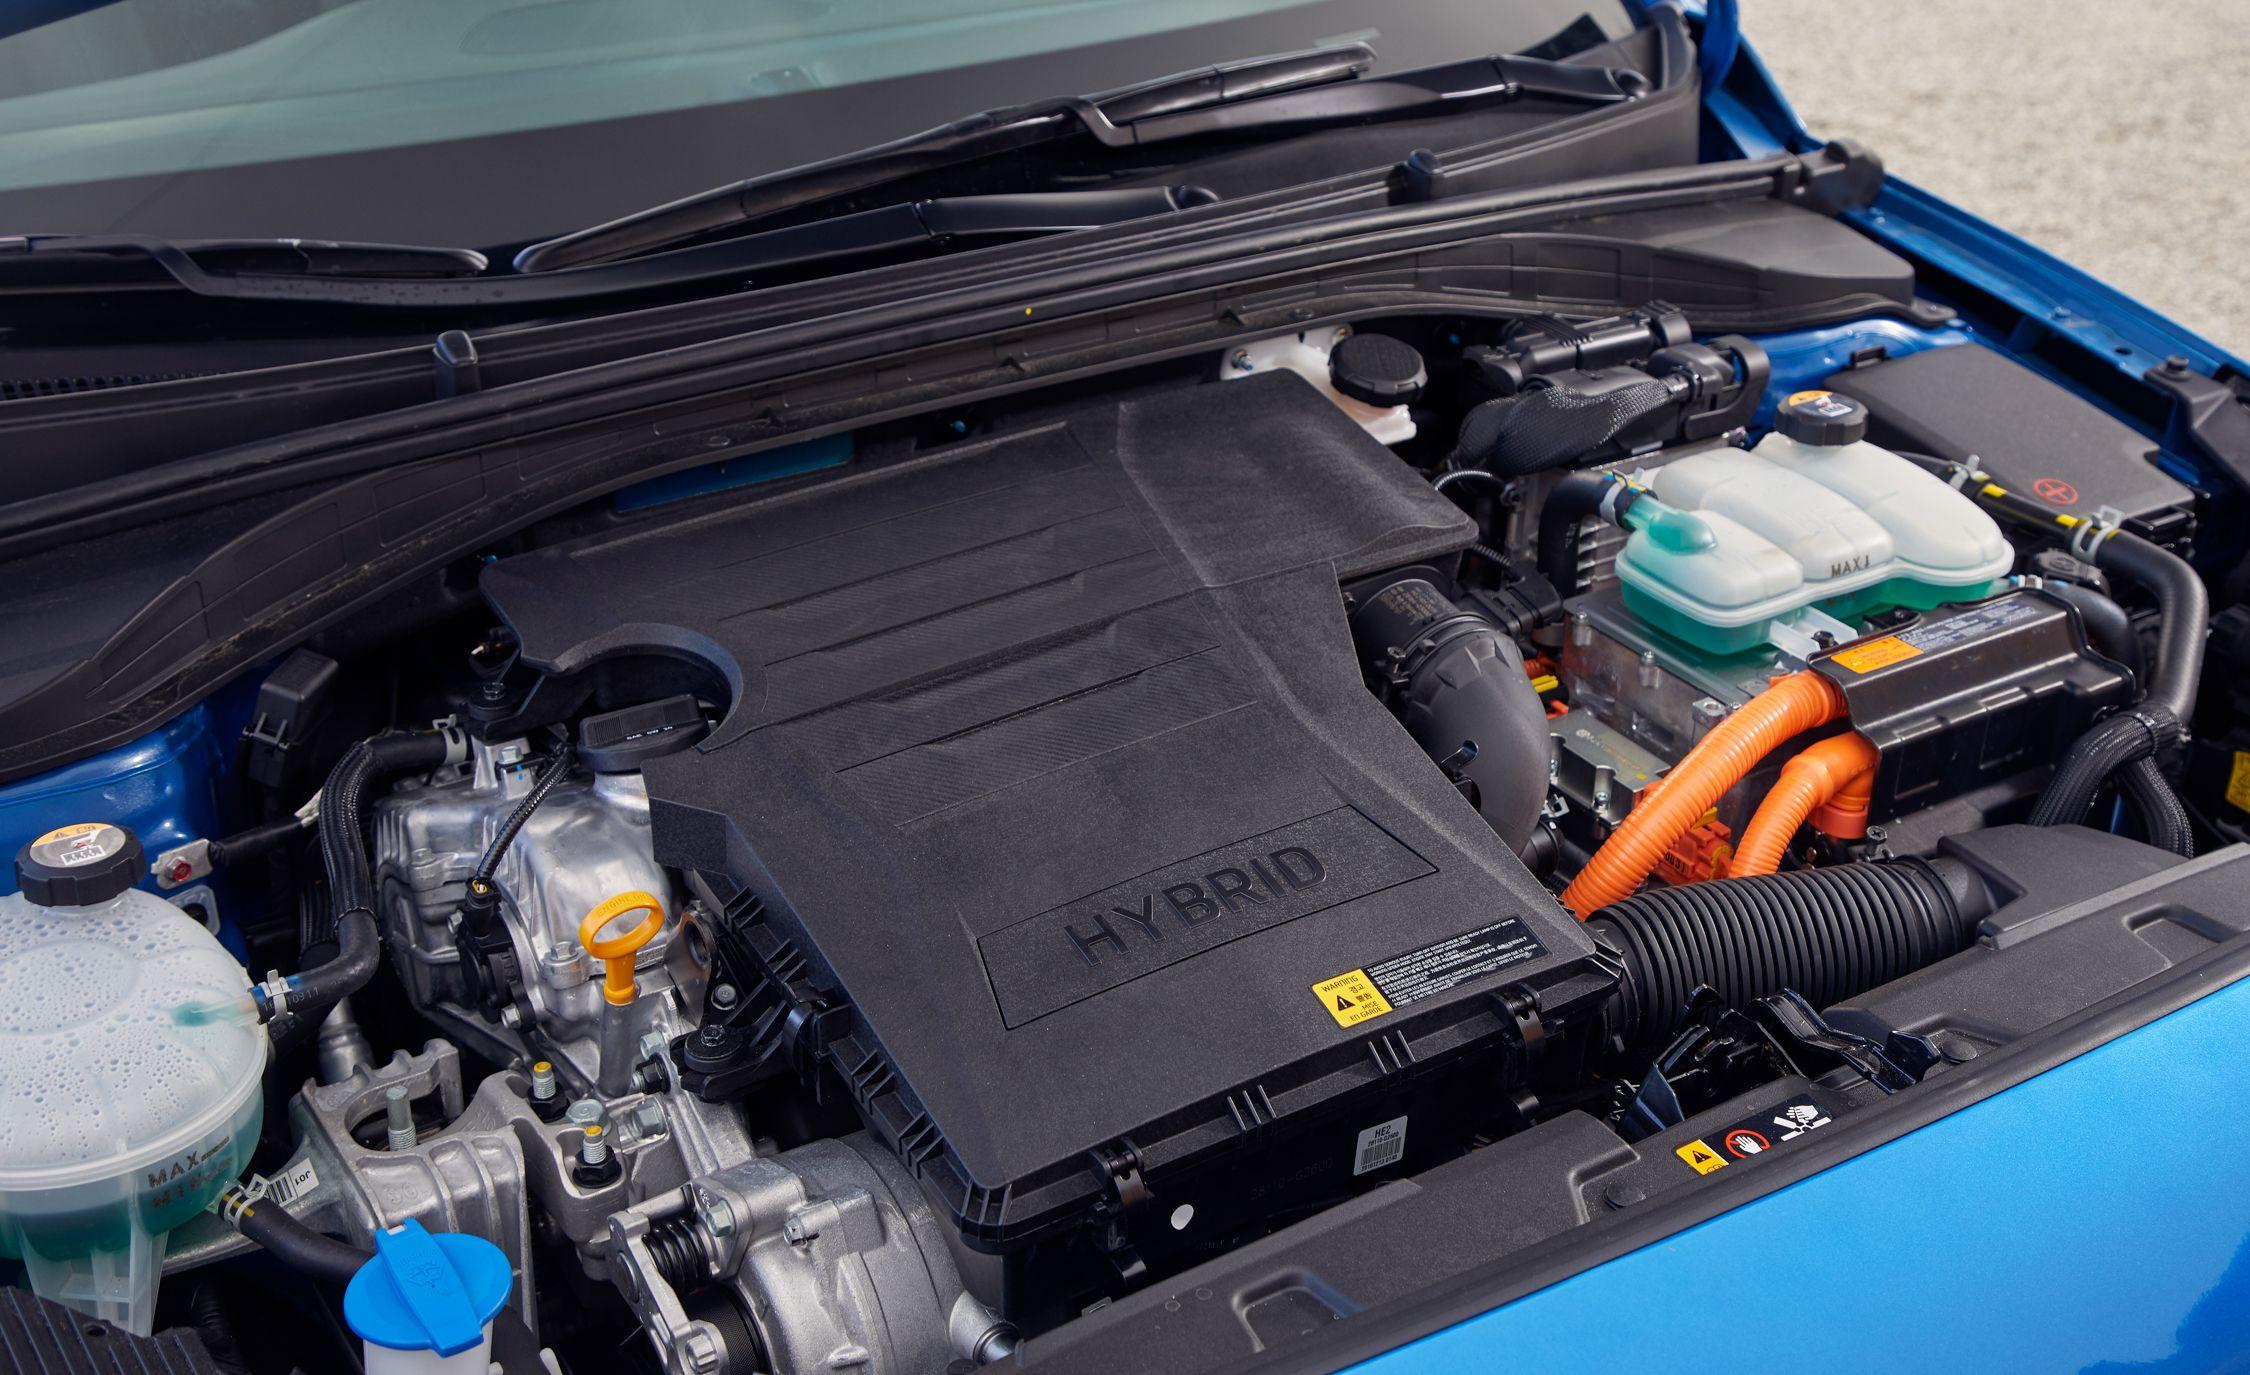 Hyundai Eliminates Traditional Battery In Ioniq Hybrid News Car Jump Start Diagram And Driver